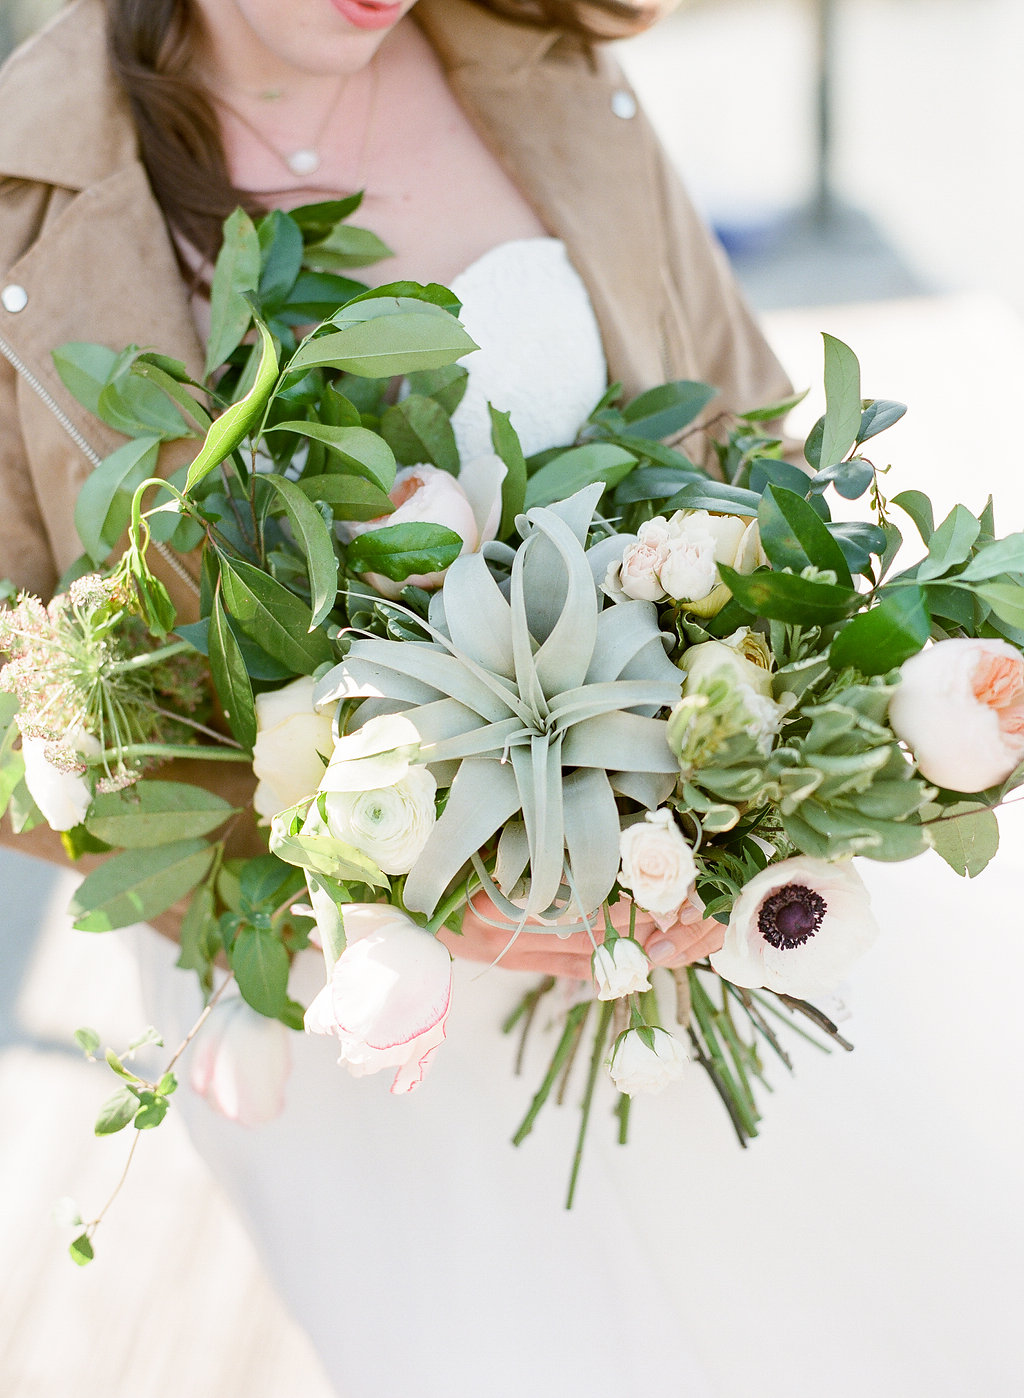 the-wyld-dock-bar-ivory-and-beau-savannah-wedding-event-designer-planner-sarah-seven-worthington-wedding-dress-flowy-organza-romantic-boho-wedding-dress-savannah-bridal-boutique-savannah-cheap-wedding-dresses-savannah-bridal-shop.jpg